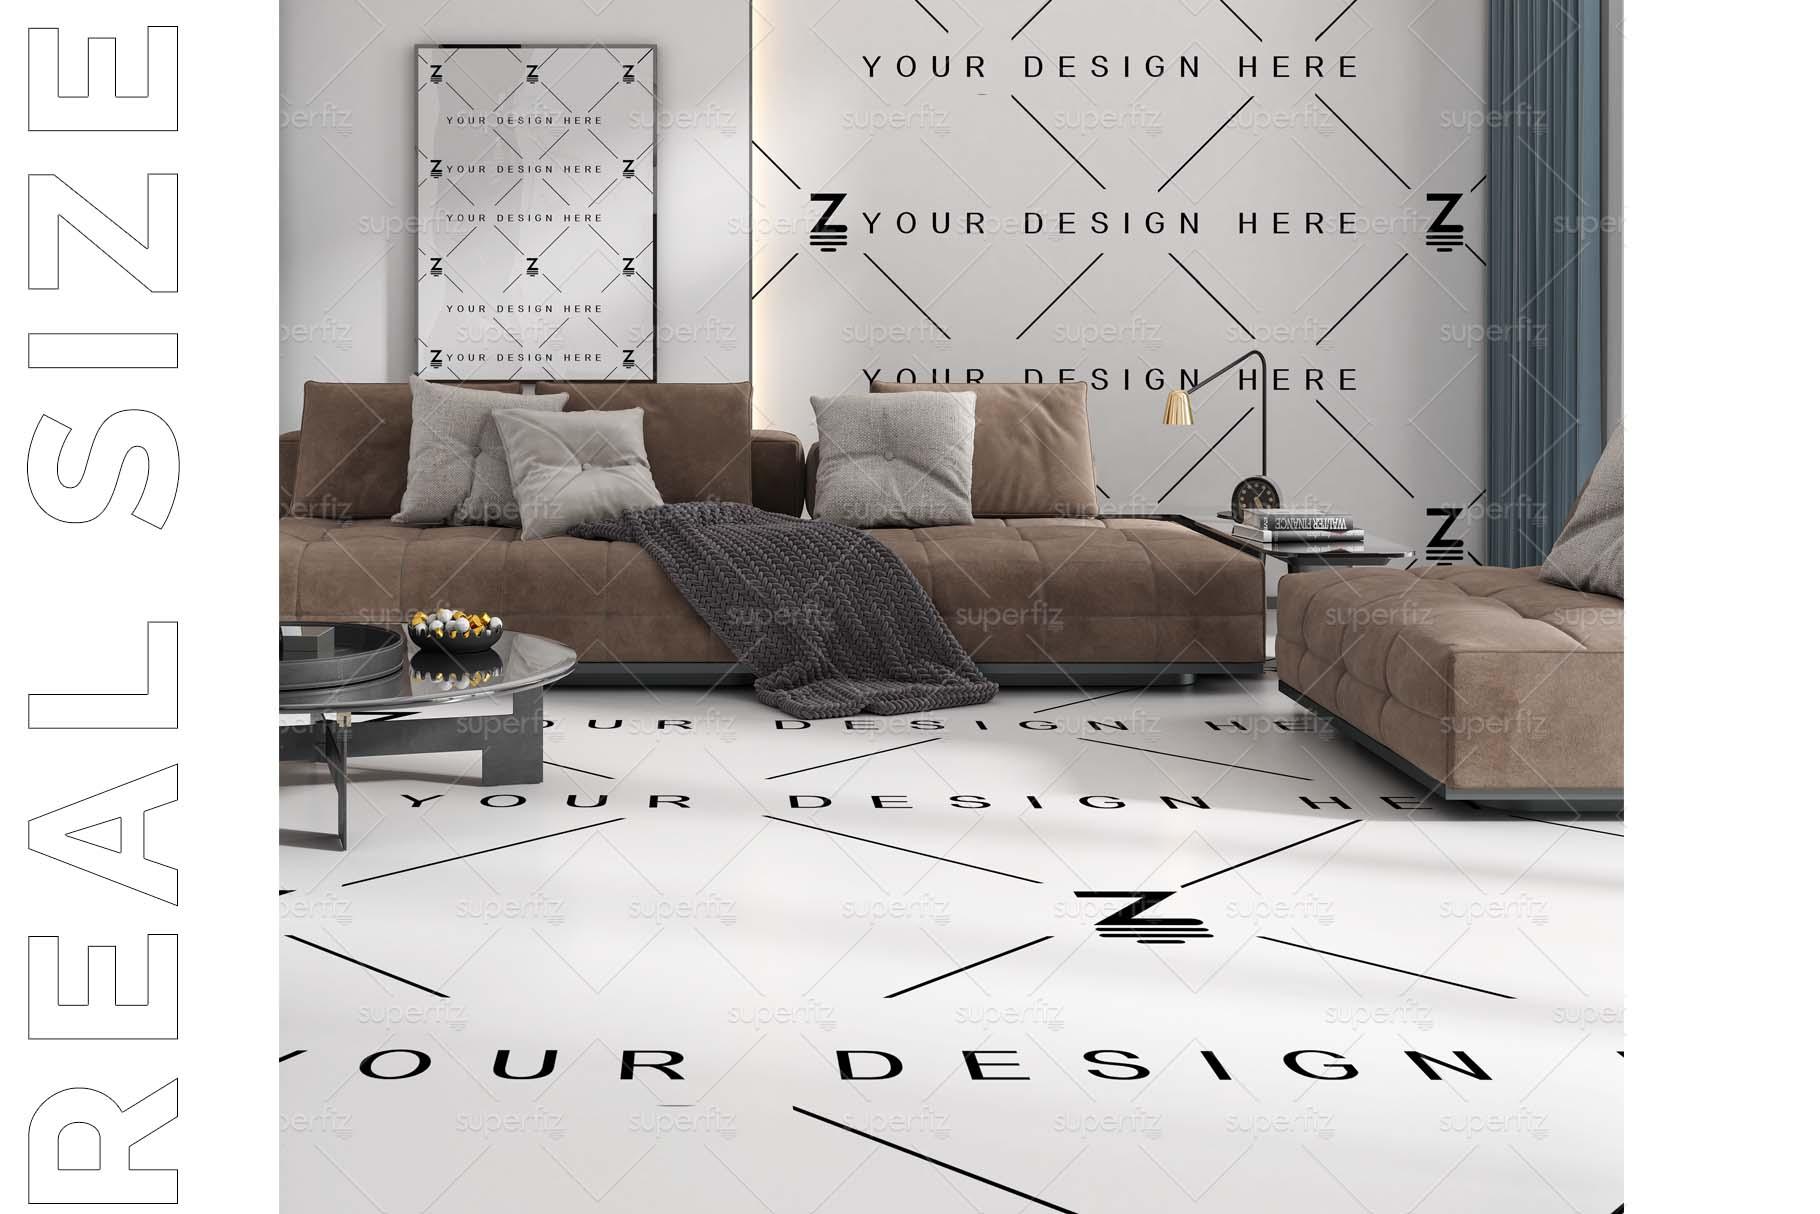 Blank Floor and Wall PSD Mockup Livingroom SM75 example image 4